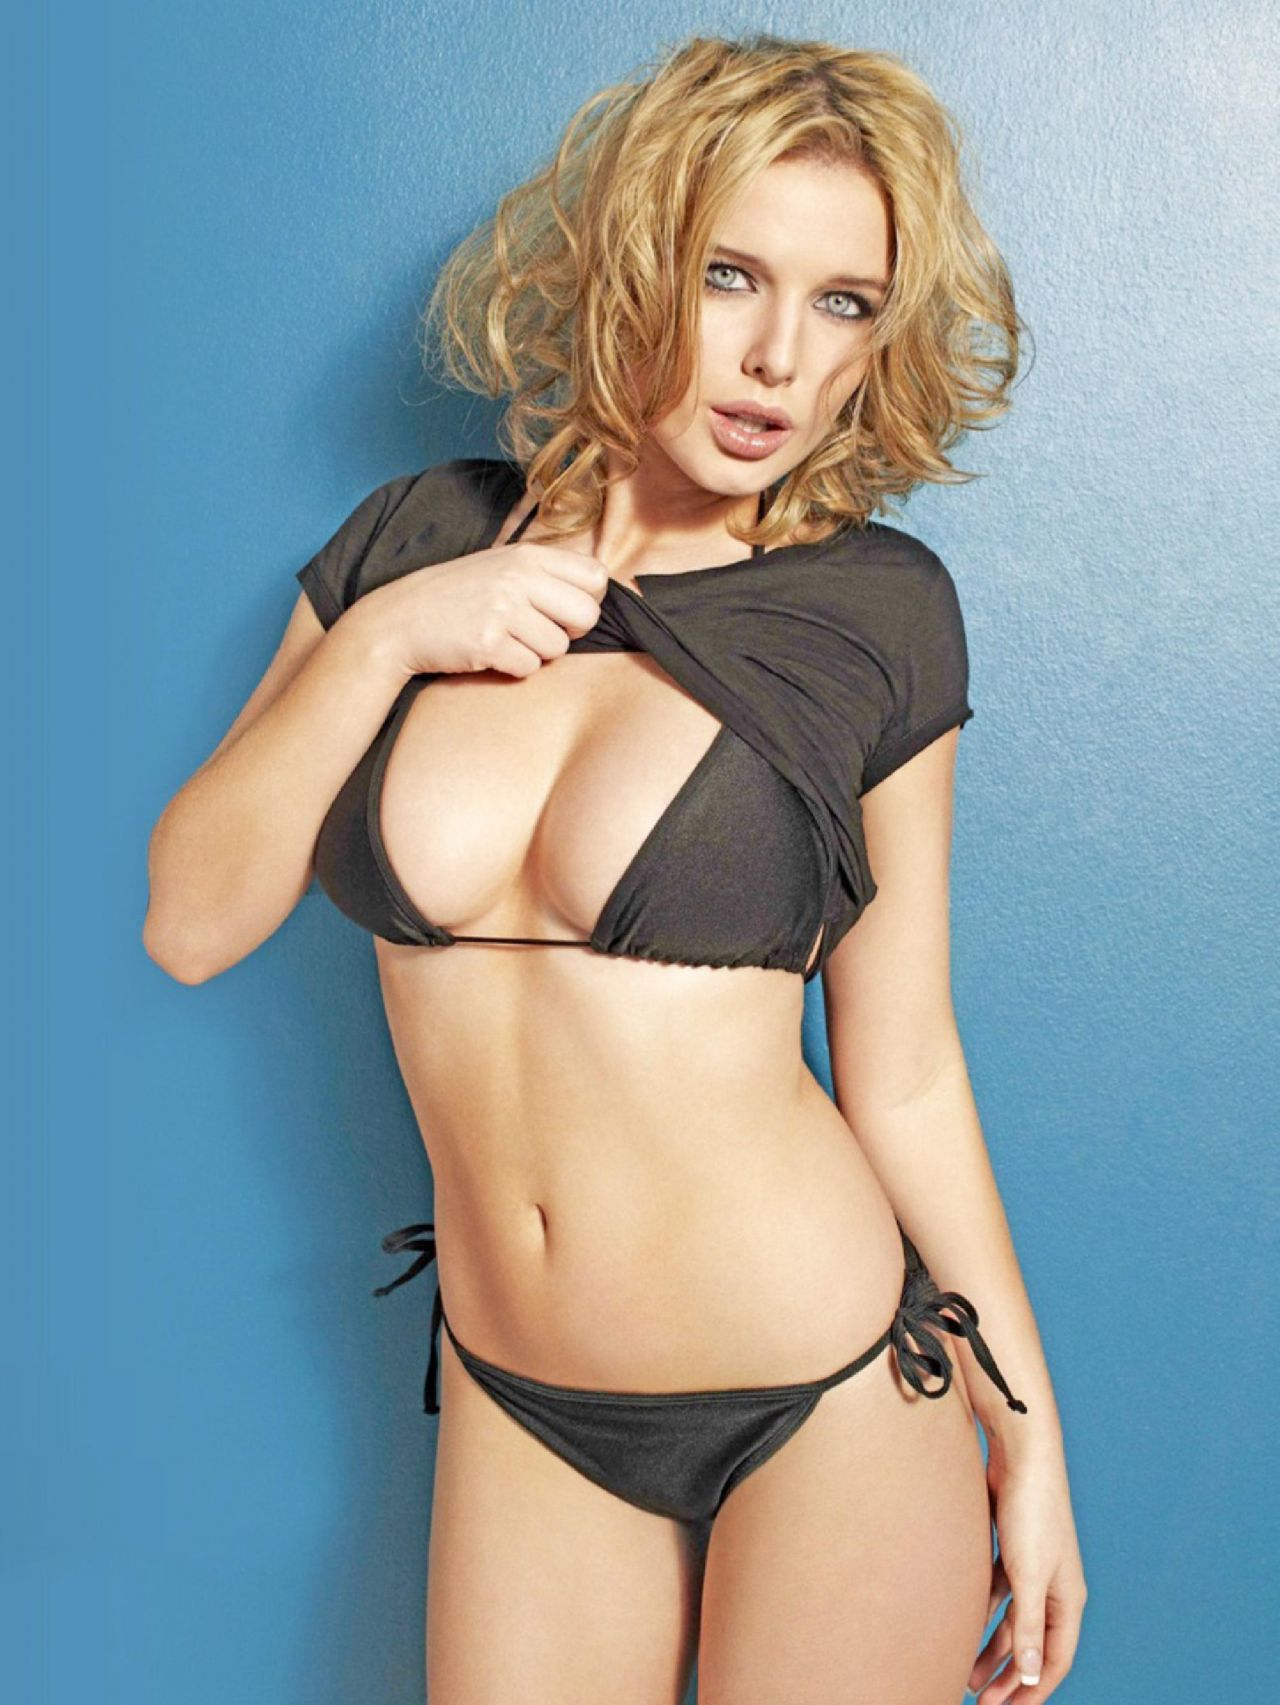 Helen Flanagan Calendar 2014 in helen flanagan | celebrities in bikinis | pinterest | helen